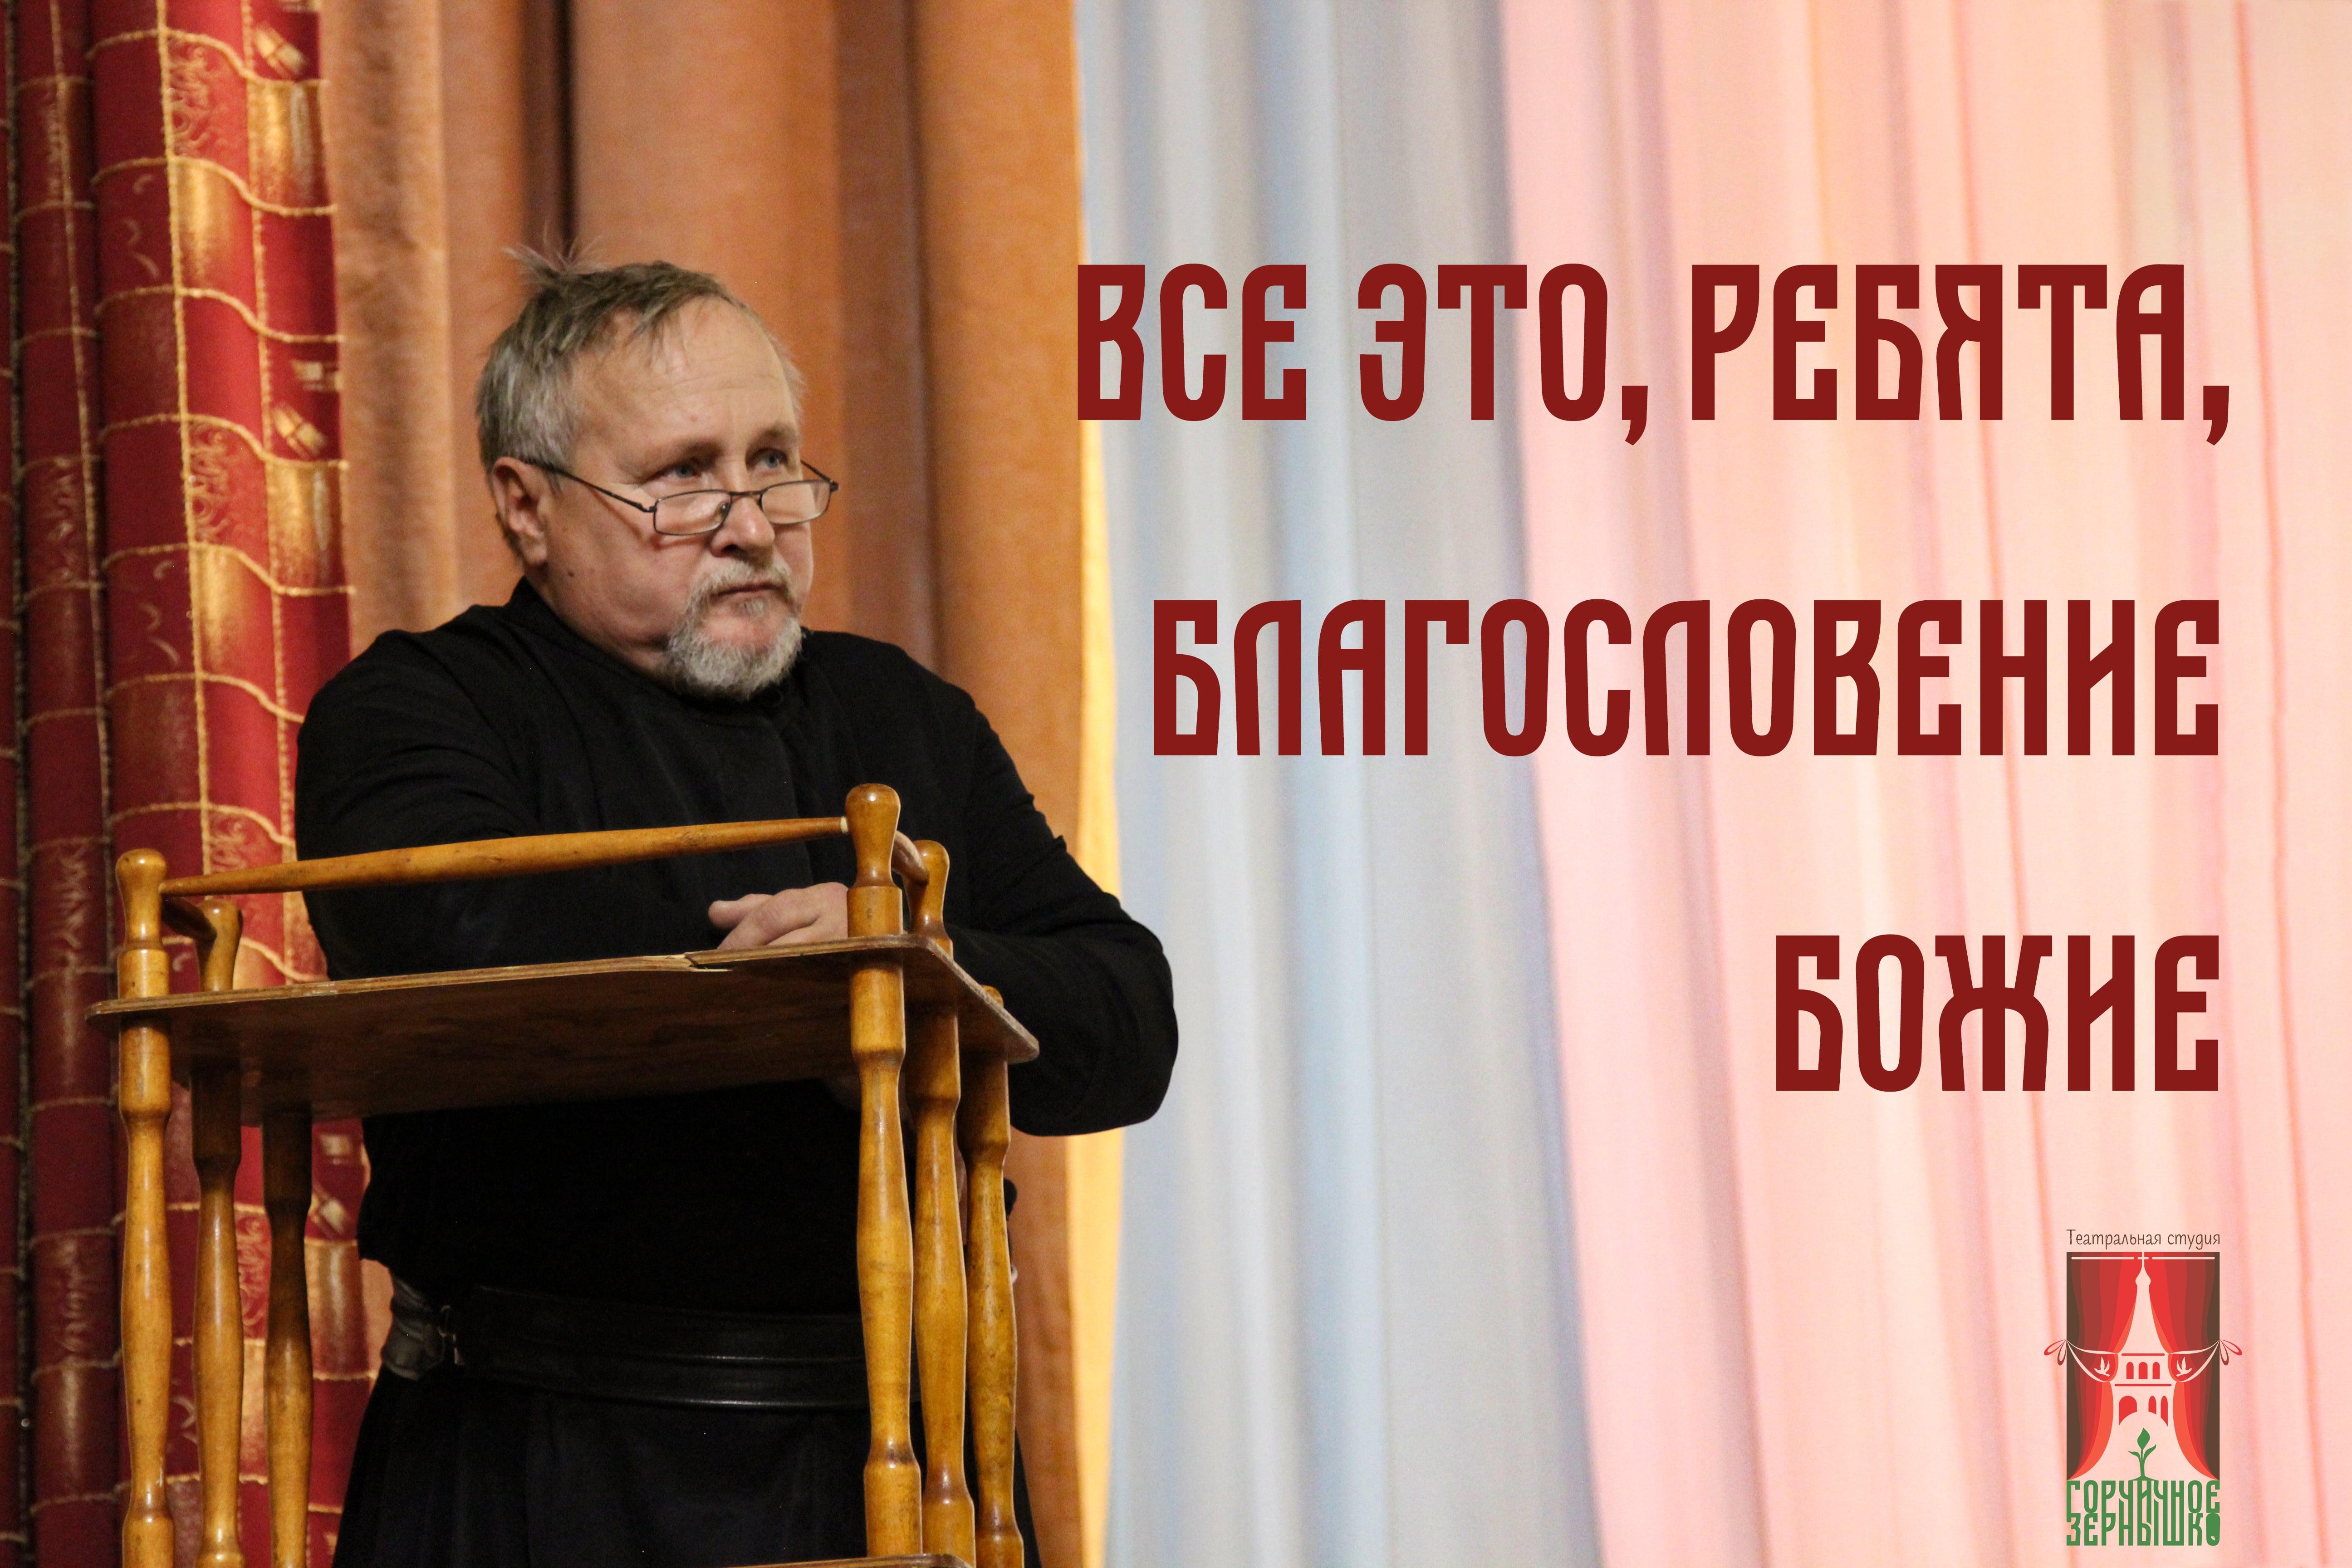 http://monuspen.ru/photoreports/97627d911b6ceee6026cc1d83fc8321v.jpg